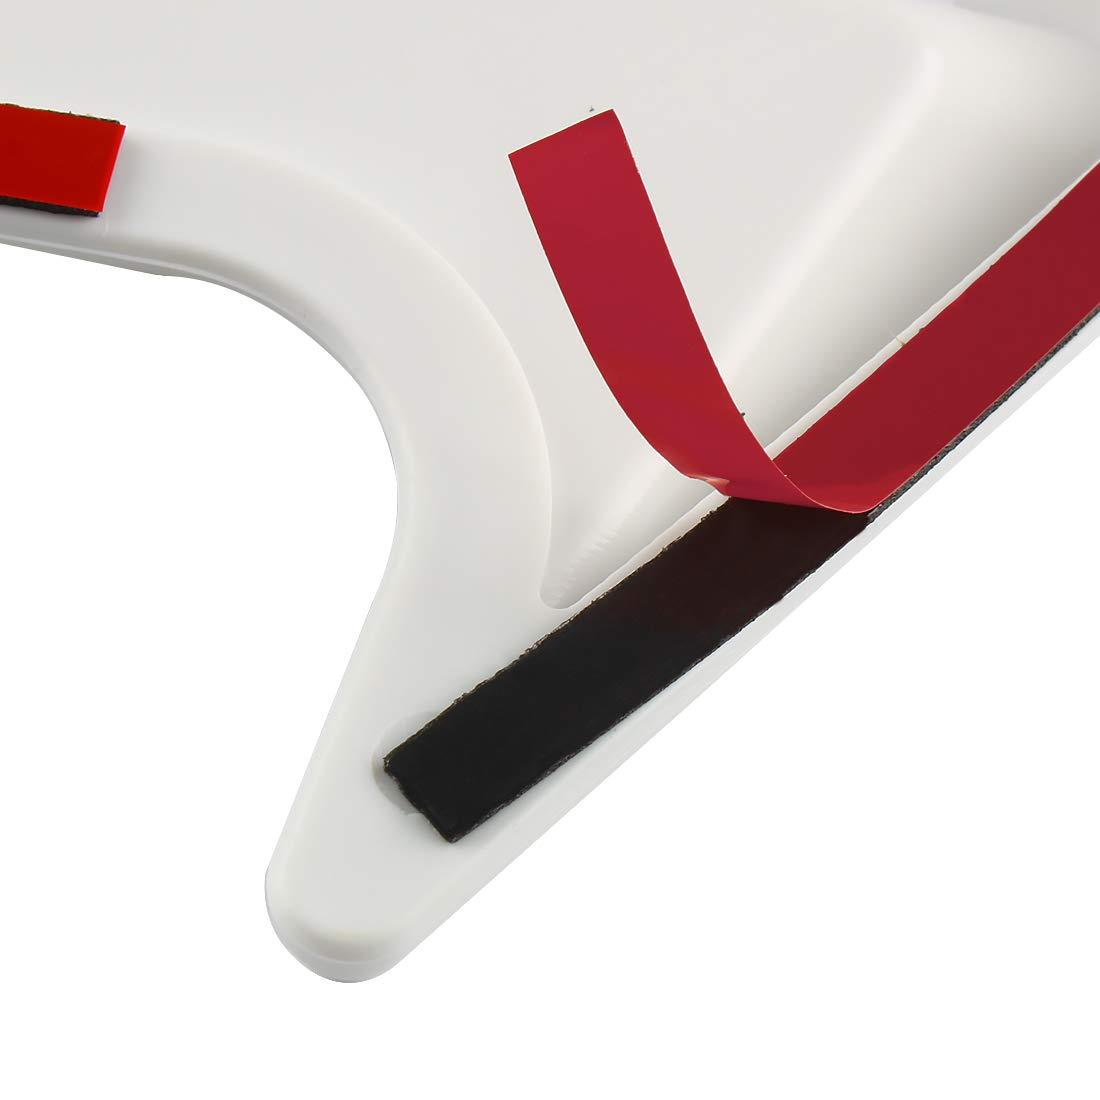 Andux Land Car Vent Grille Cover Decorative Air Flow Intake 2pcs JFK-02 Black